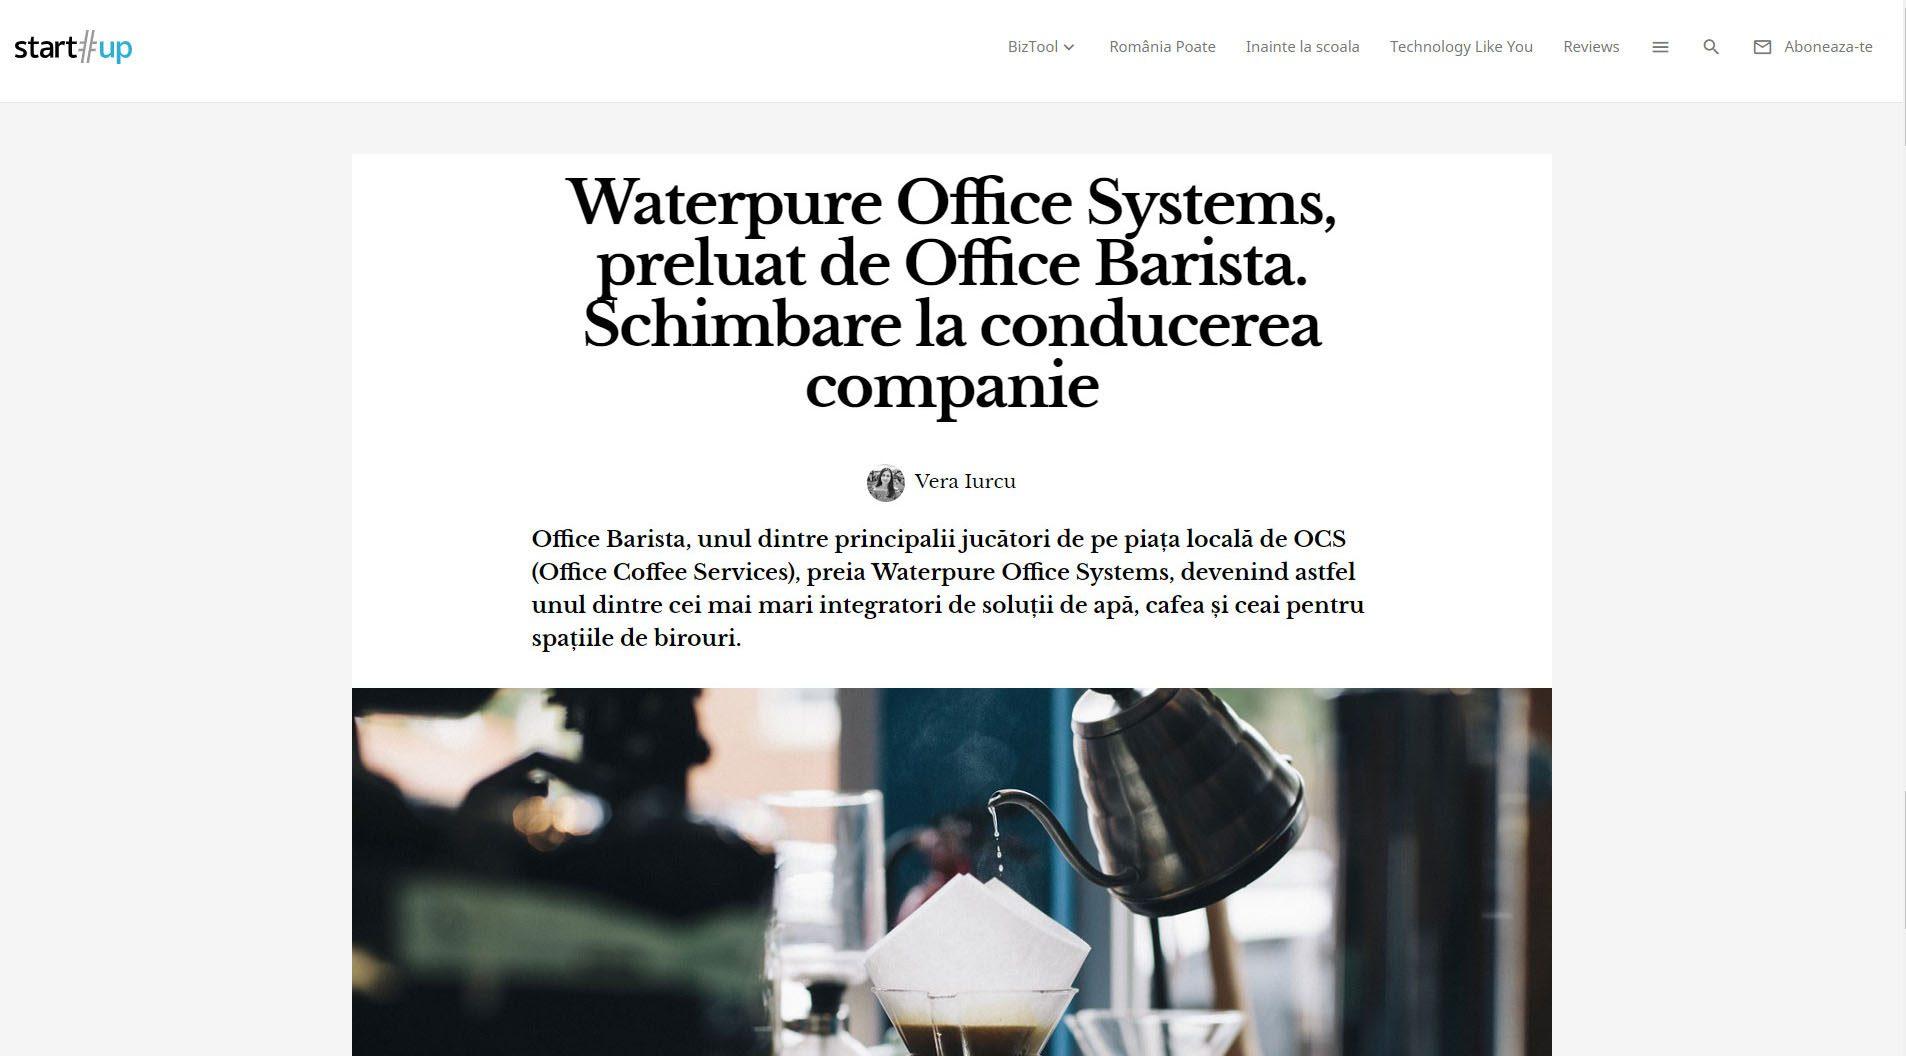 Waterpure Office Systems, preluat de Office Barista. Schimbare la conducerea companie